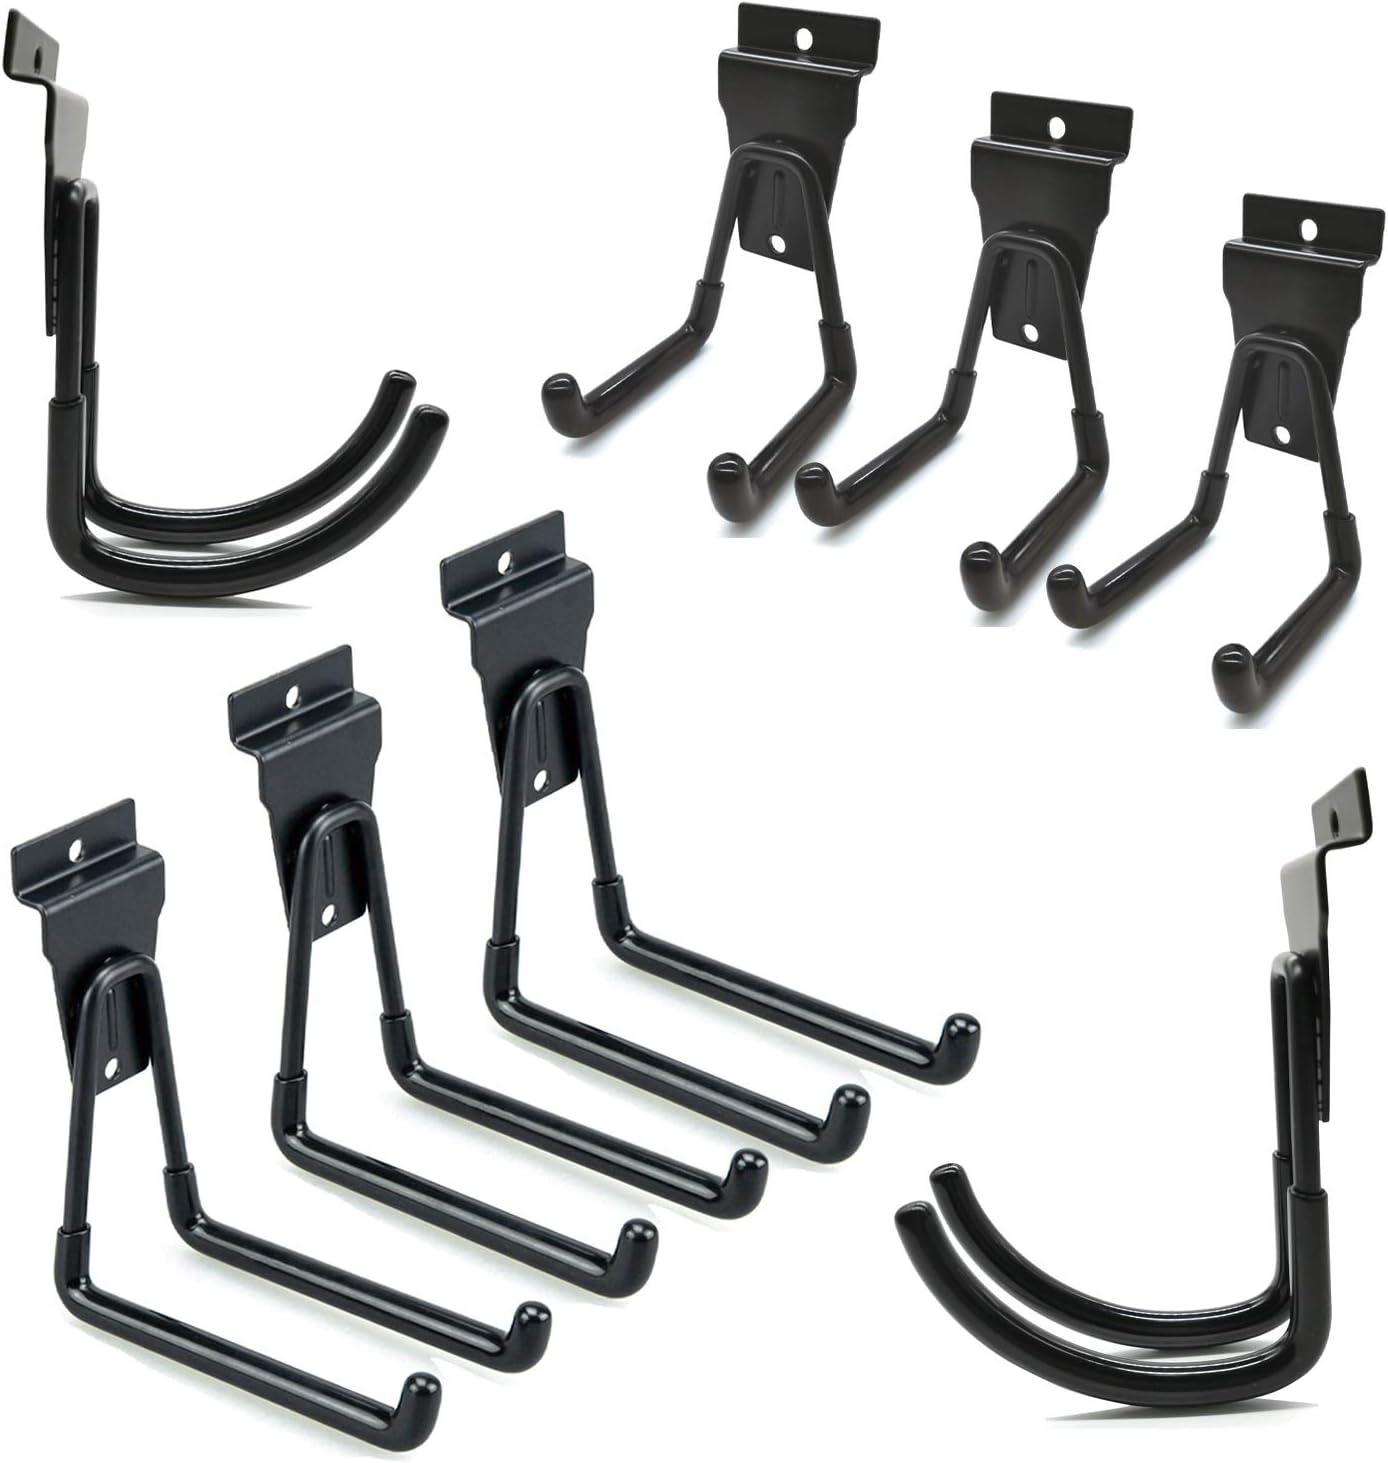 Garage Slatwall Hooks National uniform free shipping Heavy Accessories Duty Size Max 74% OFF Multi